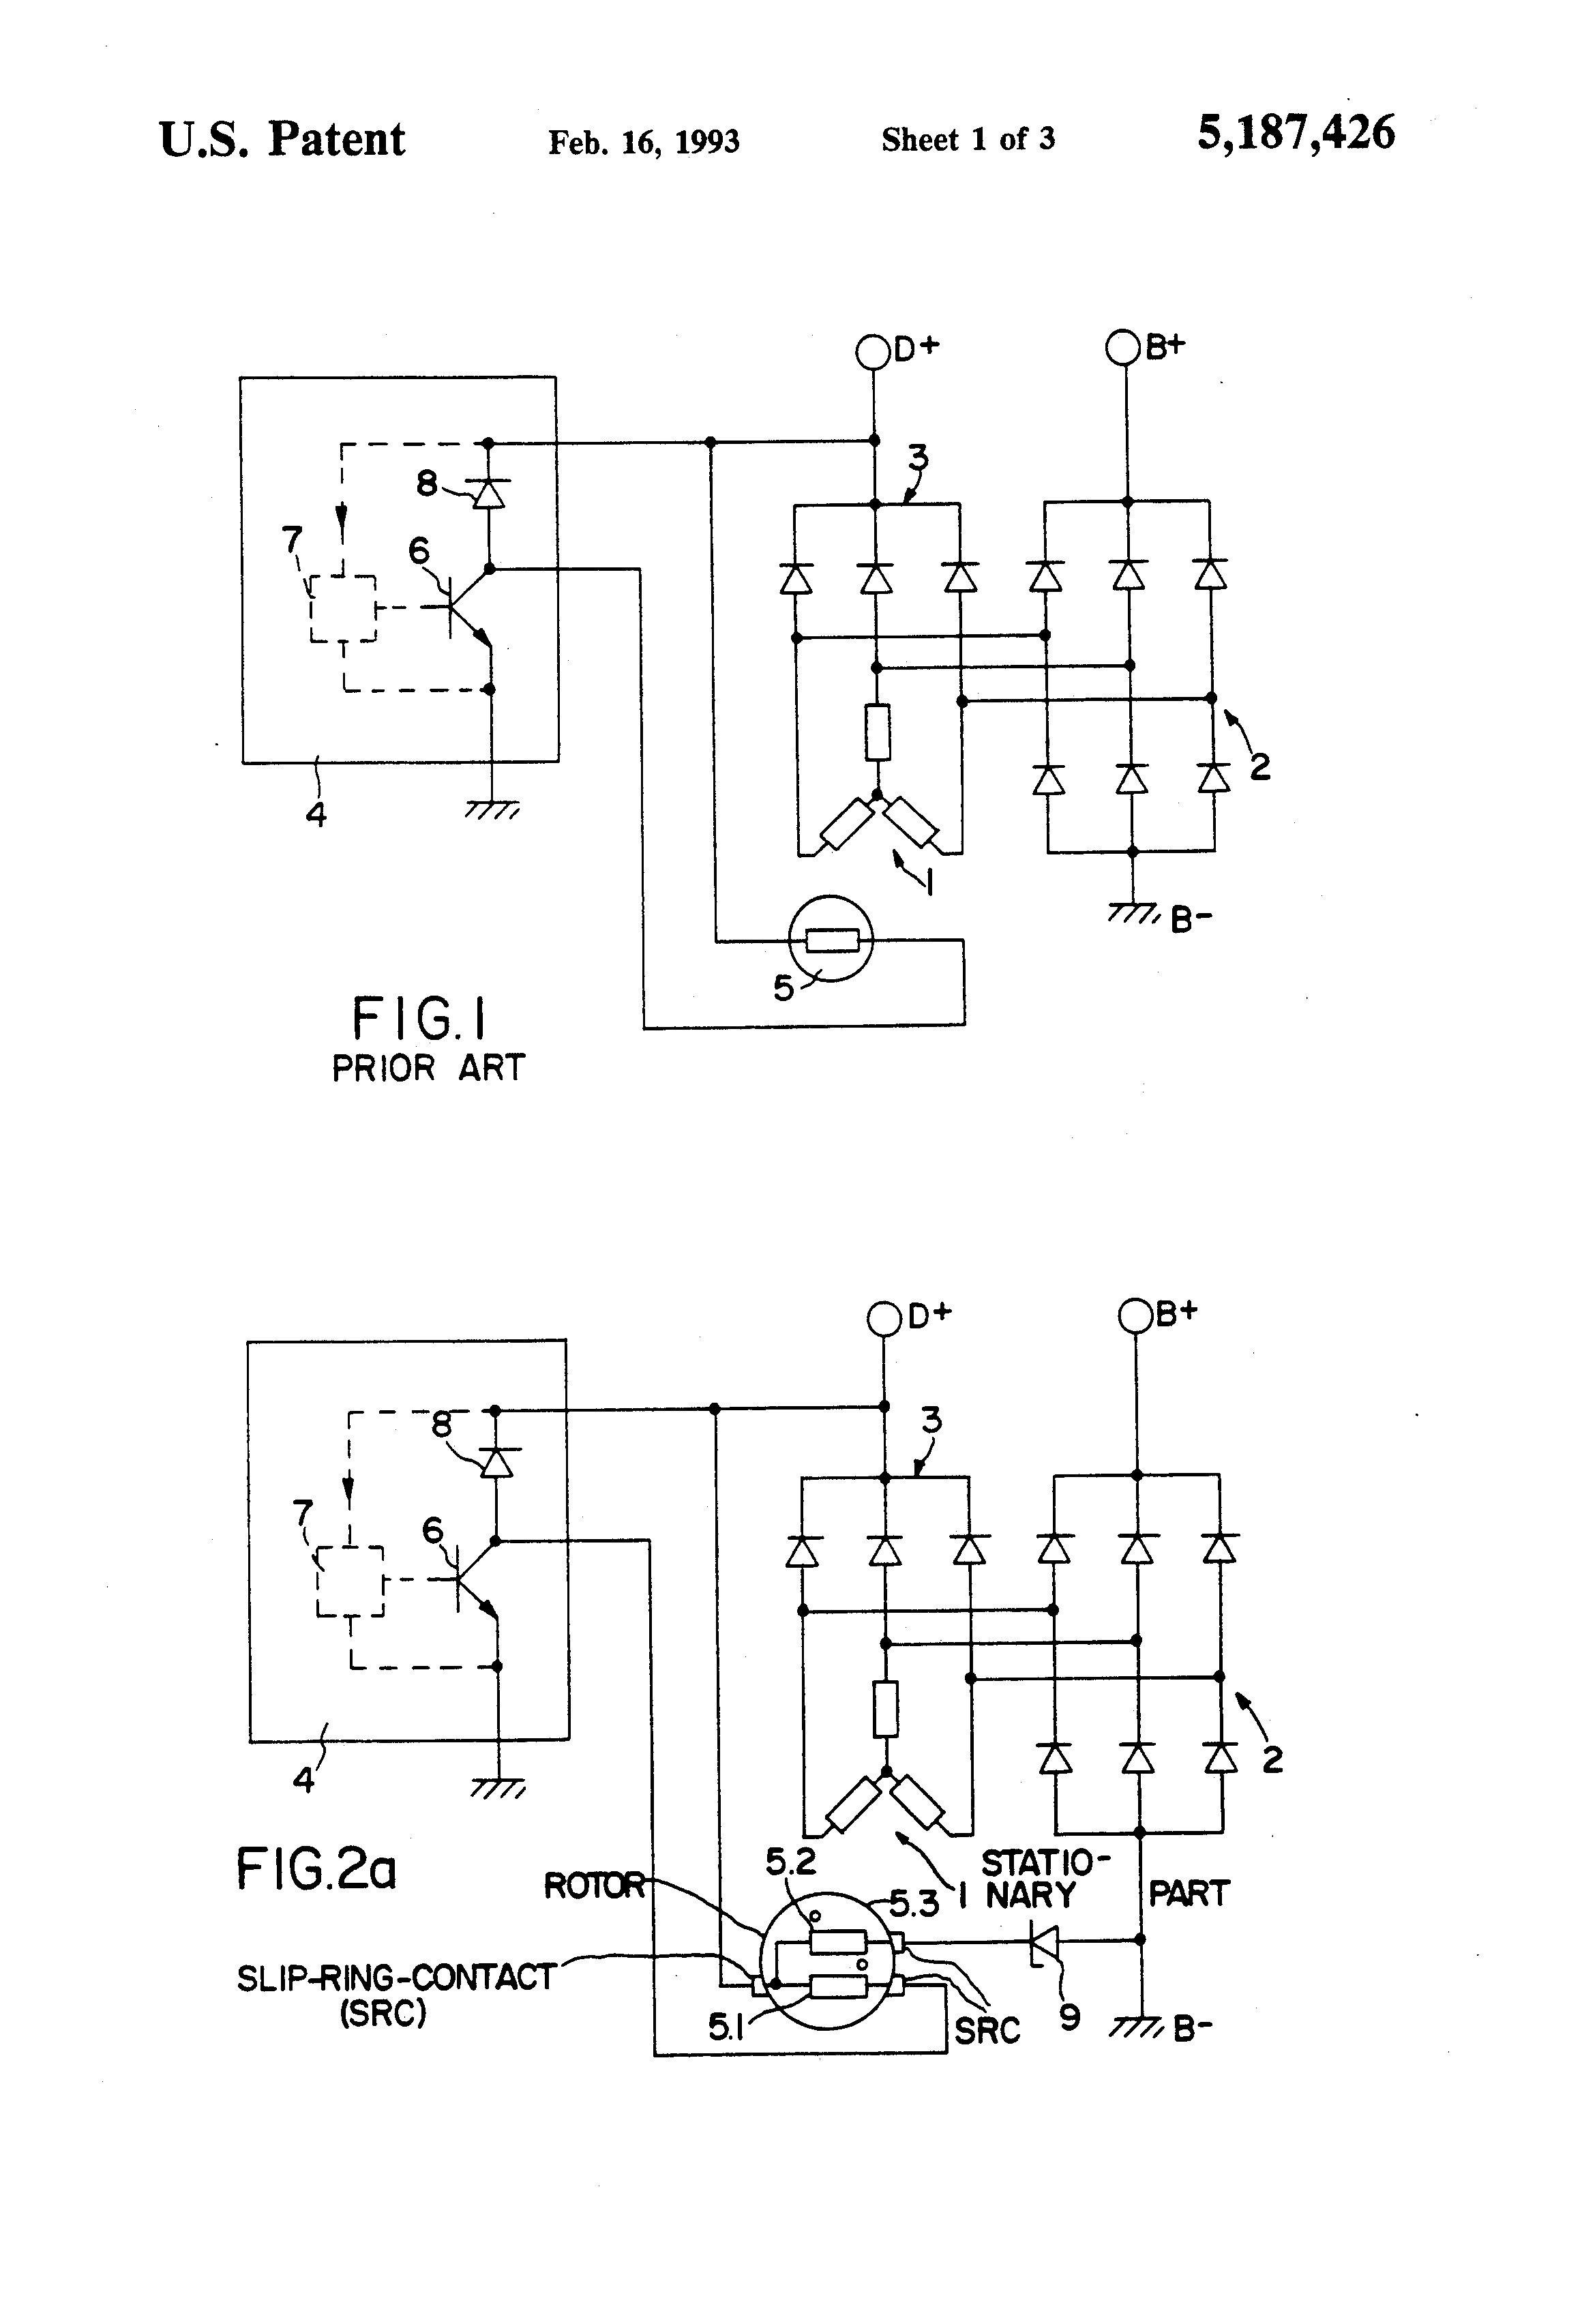 1 Cylinder Engine Diagram Hatz Engine Diagram Another Blog About Wiring Diagram • Of 1 Cylinder Engine Diagram